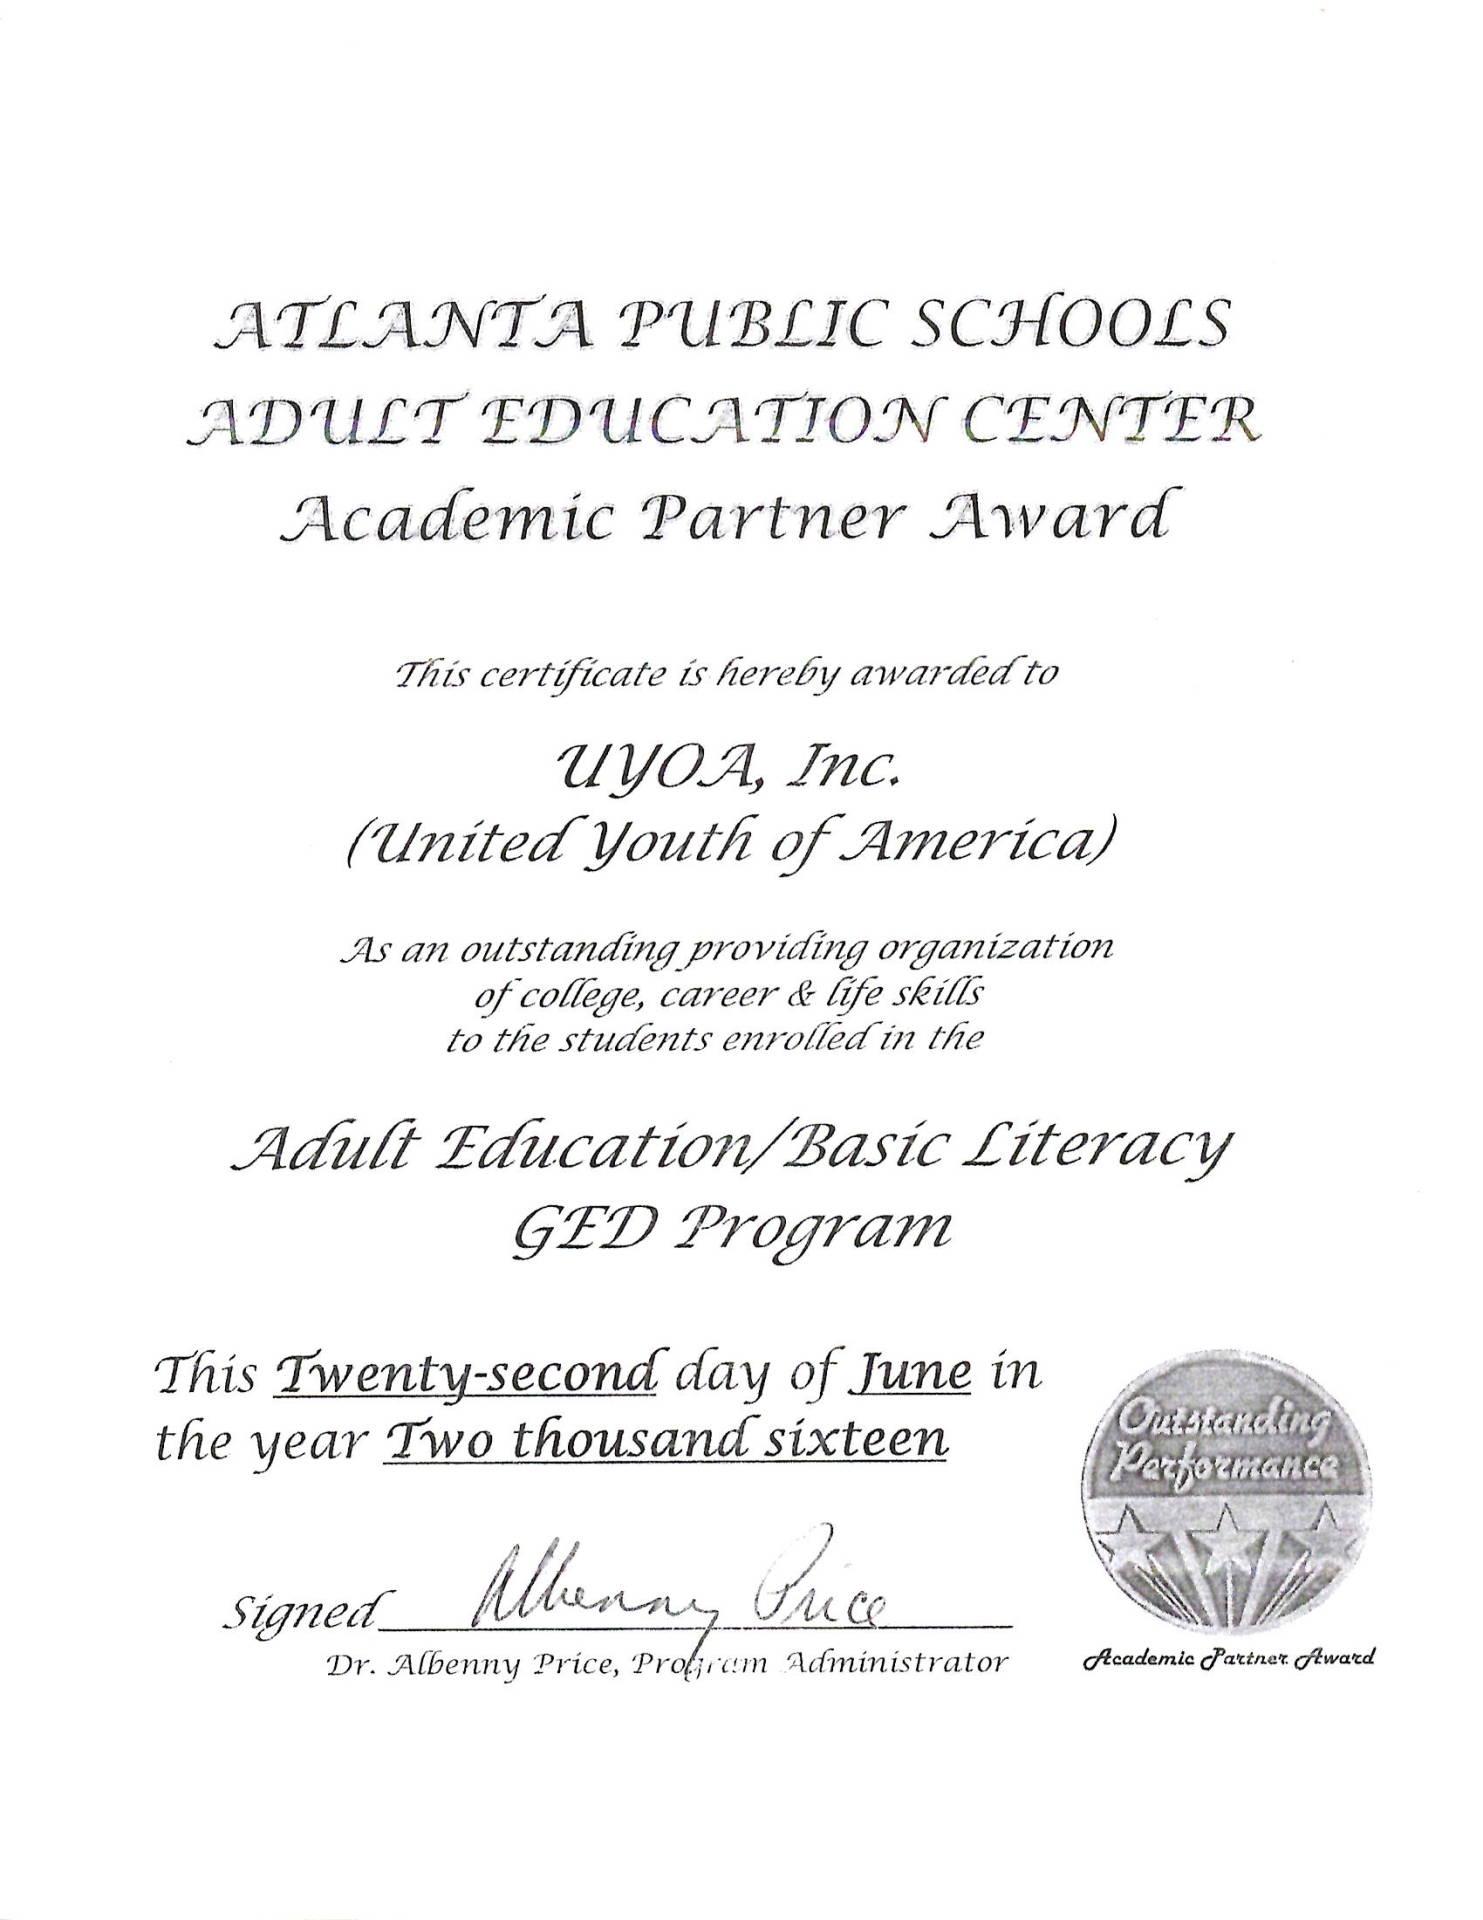 Academic Partner Award Atlanta Public Schools Adults Education